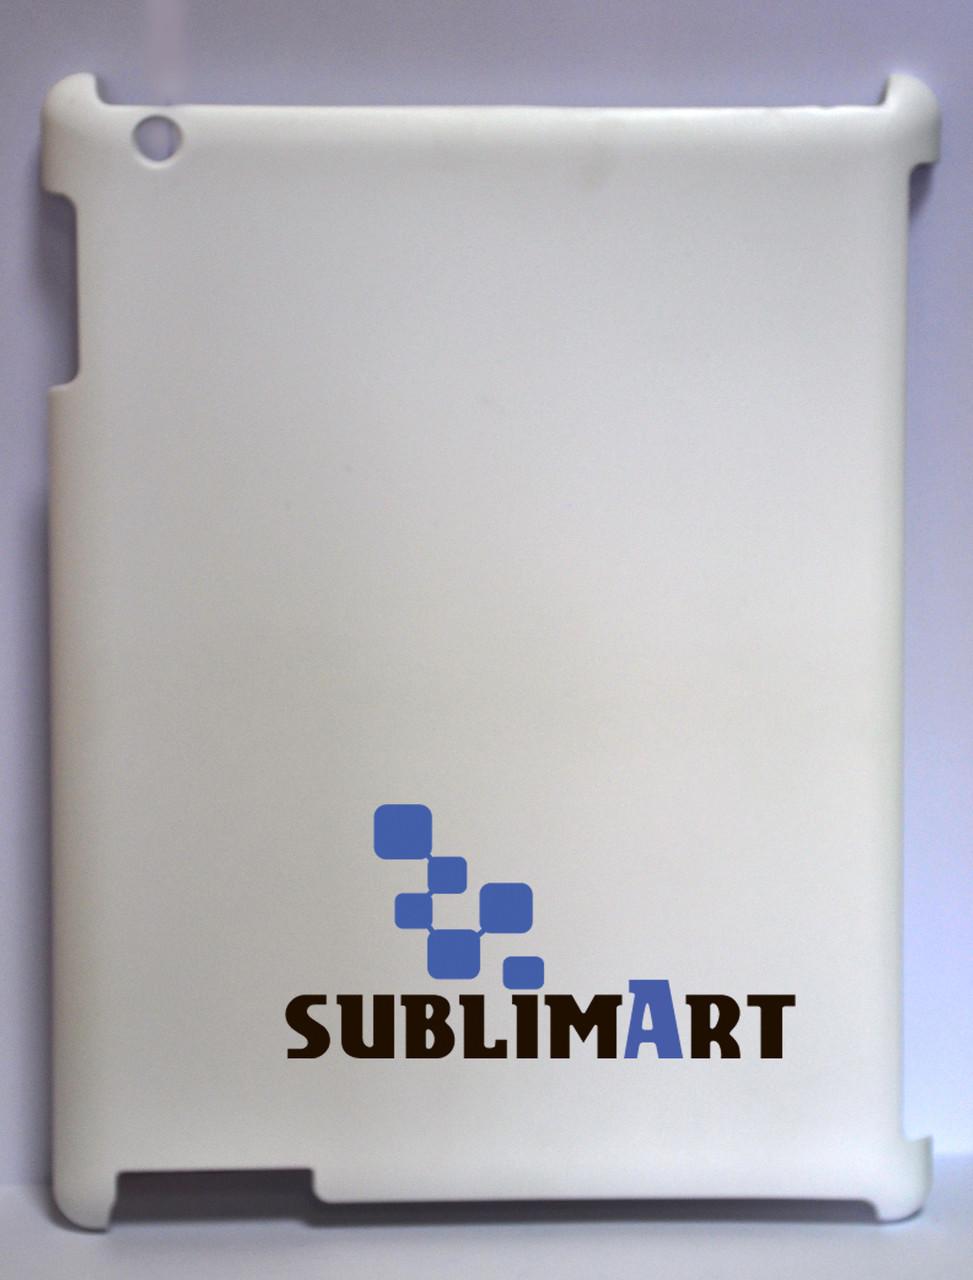 Чехол для 3D сублимации на планшете Ipad air глянцевый